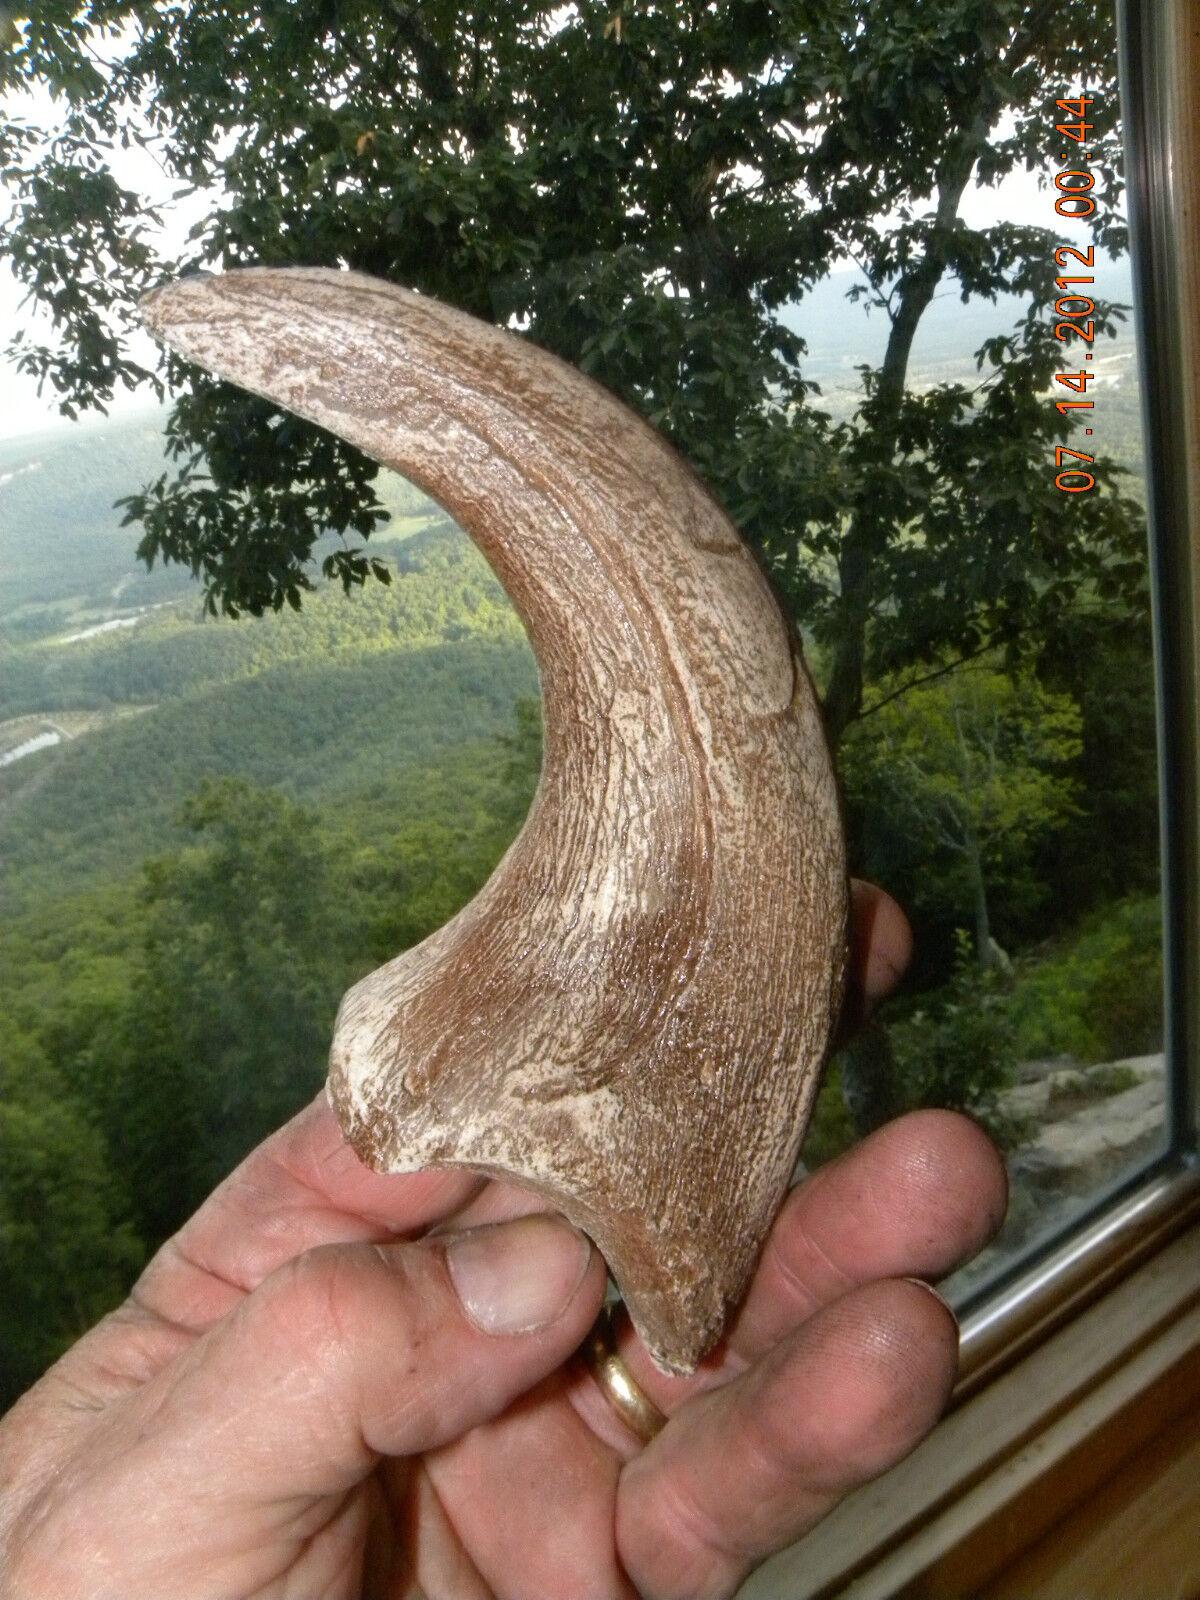 deinonychus jurassic world dinosaur fossil velociraptor